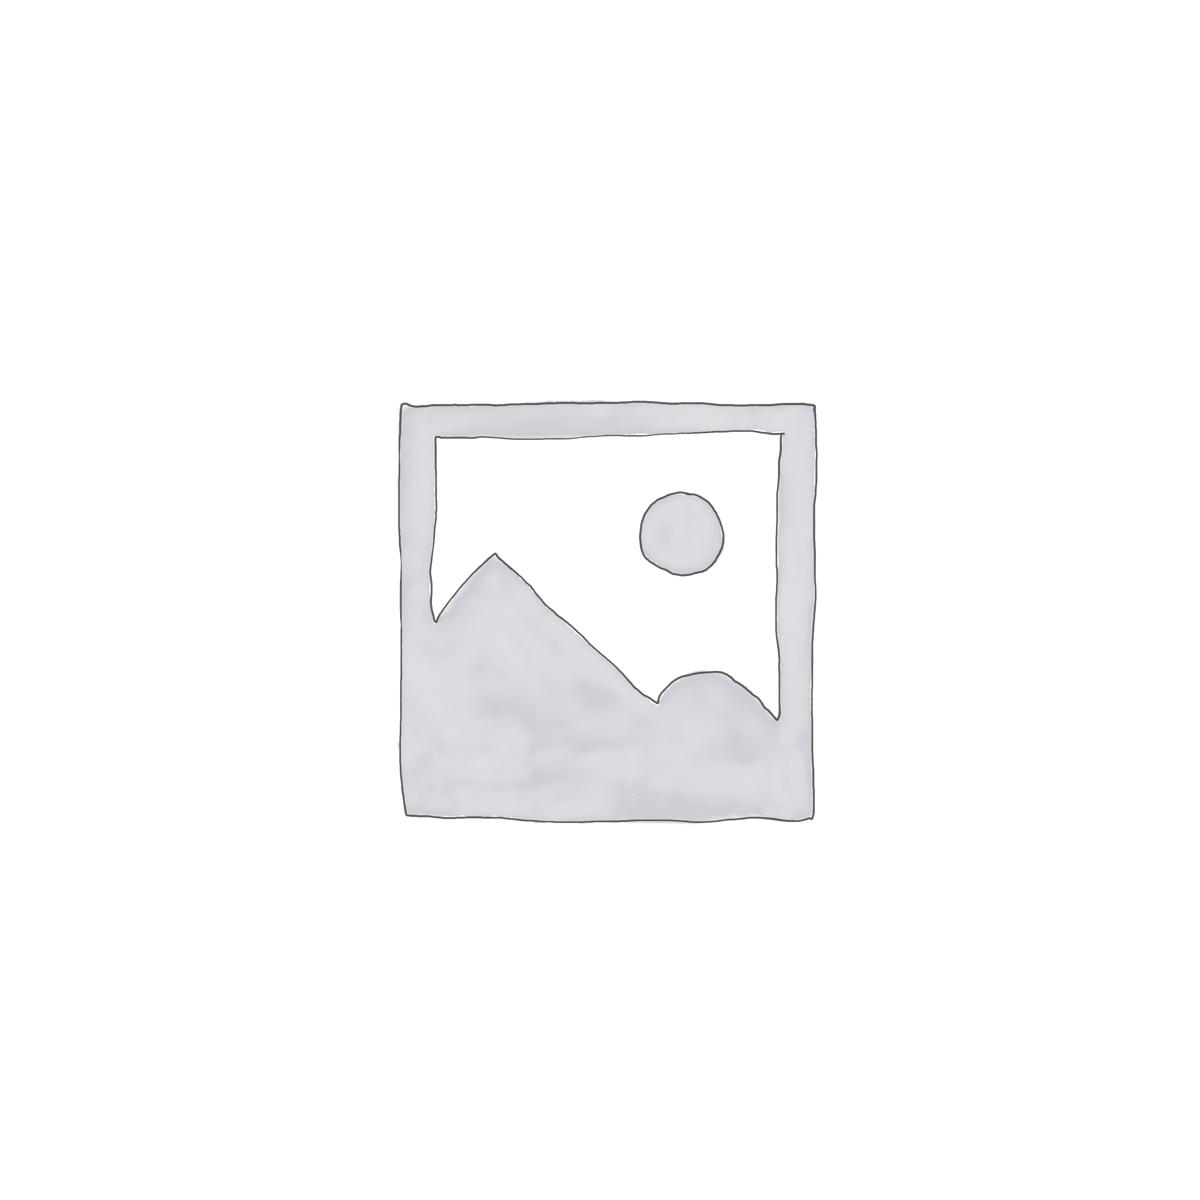 woo placeholder image left blank